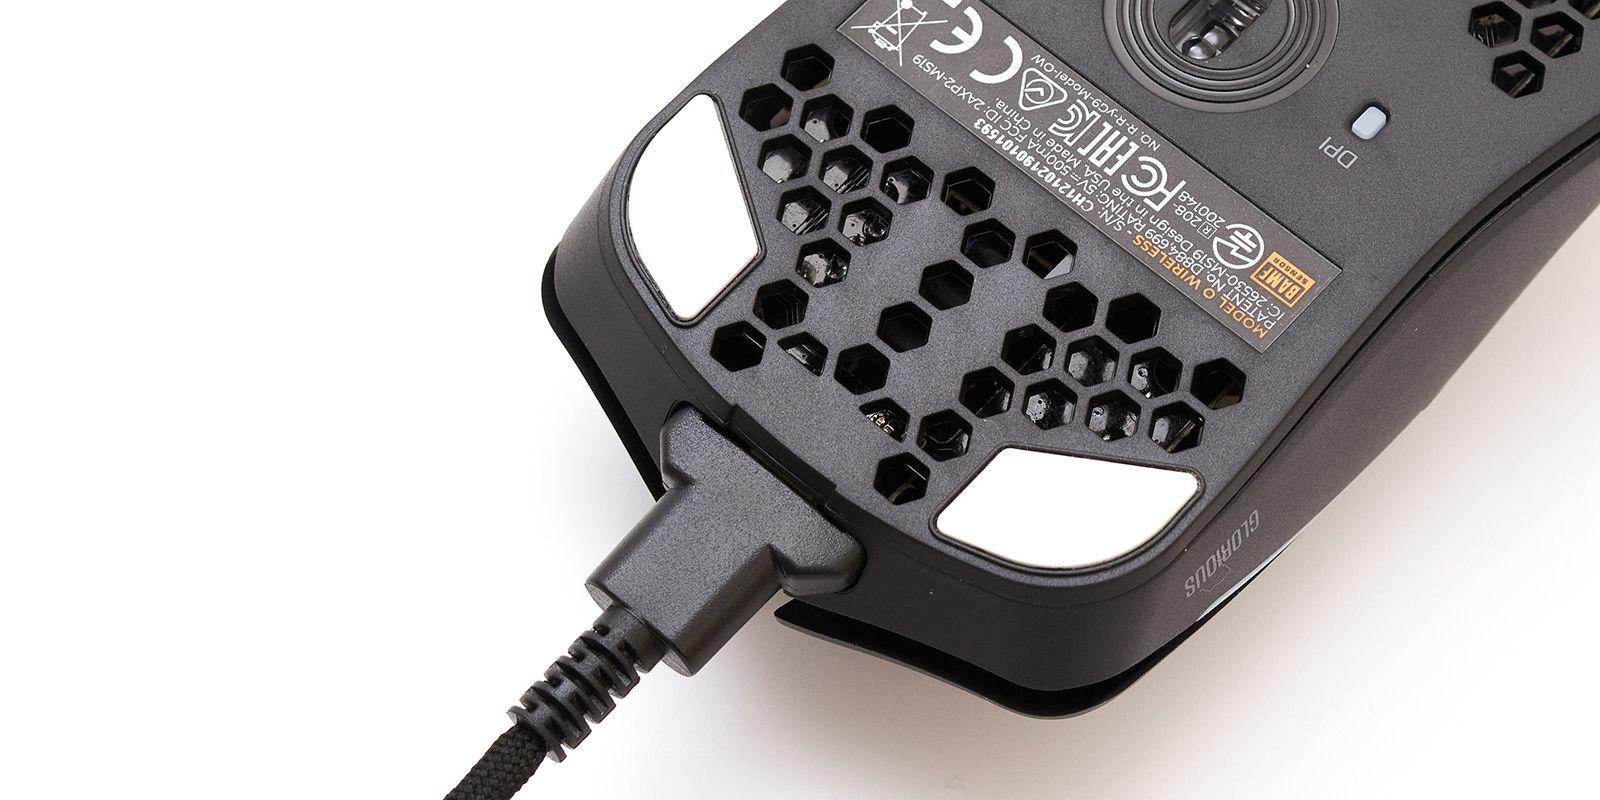 Мышь Glorious Model O Wireless. Фото 9